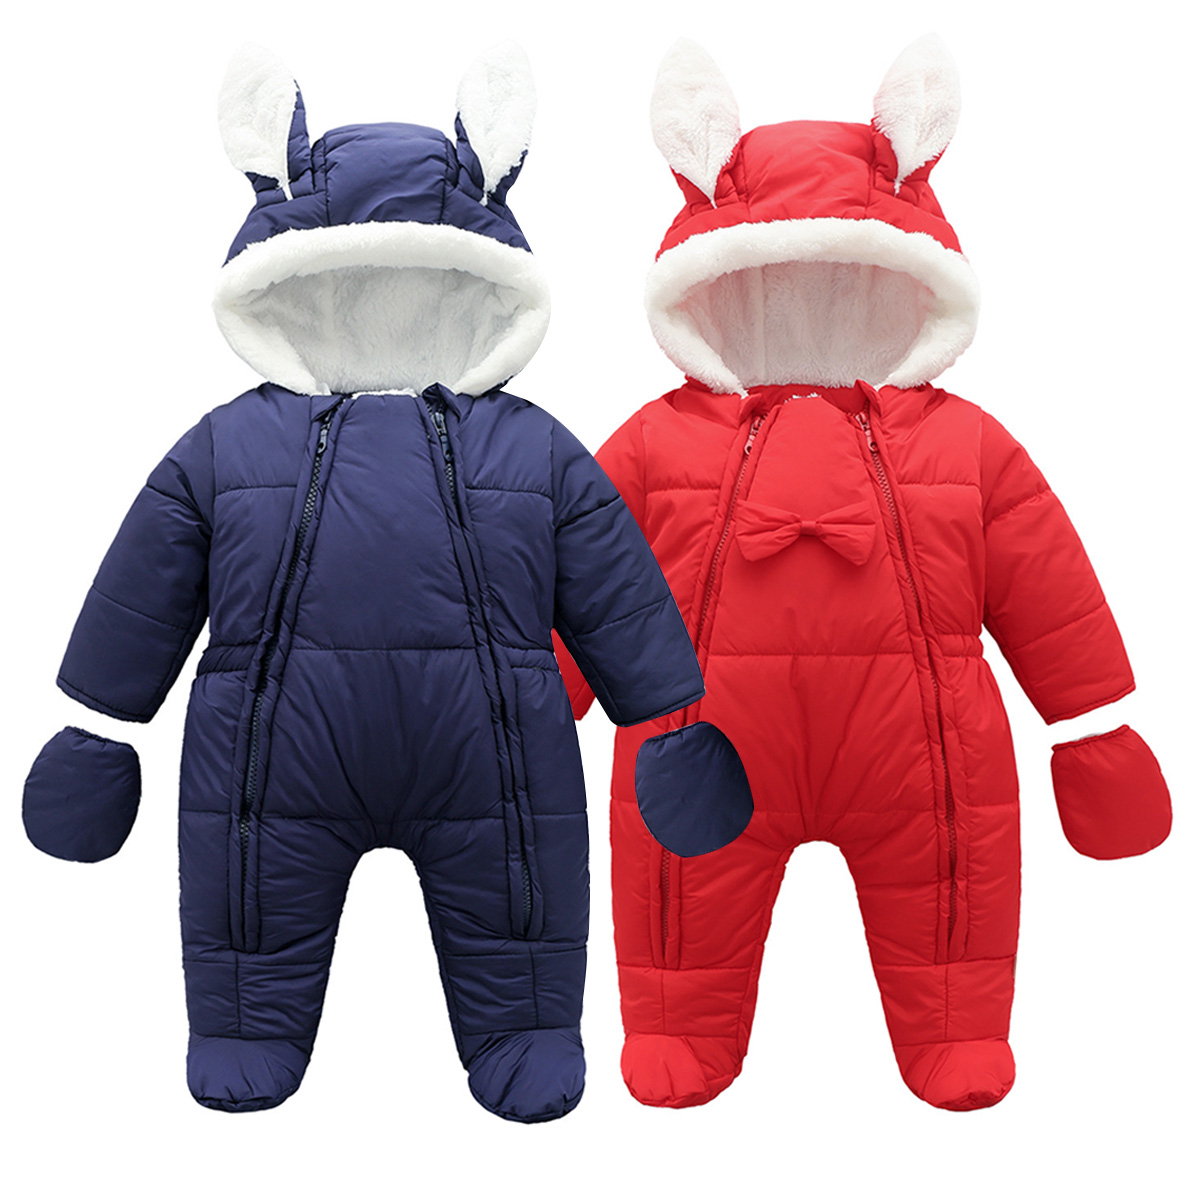 fdcf73c6d9e1 Infant Baby Girls Boys Romper Winter Hooded Outerwear Snowsuit ...